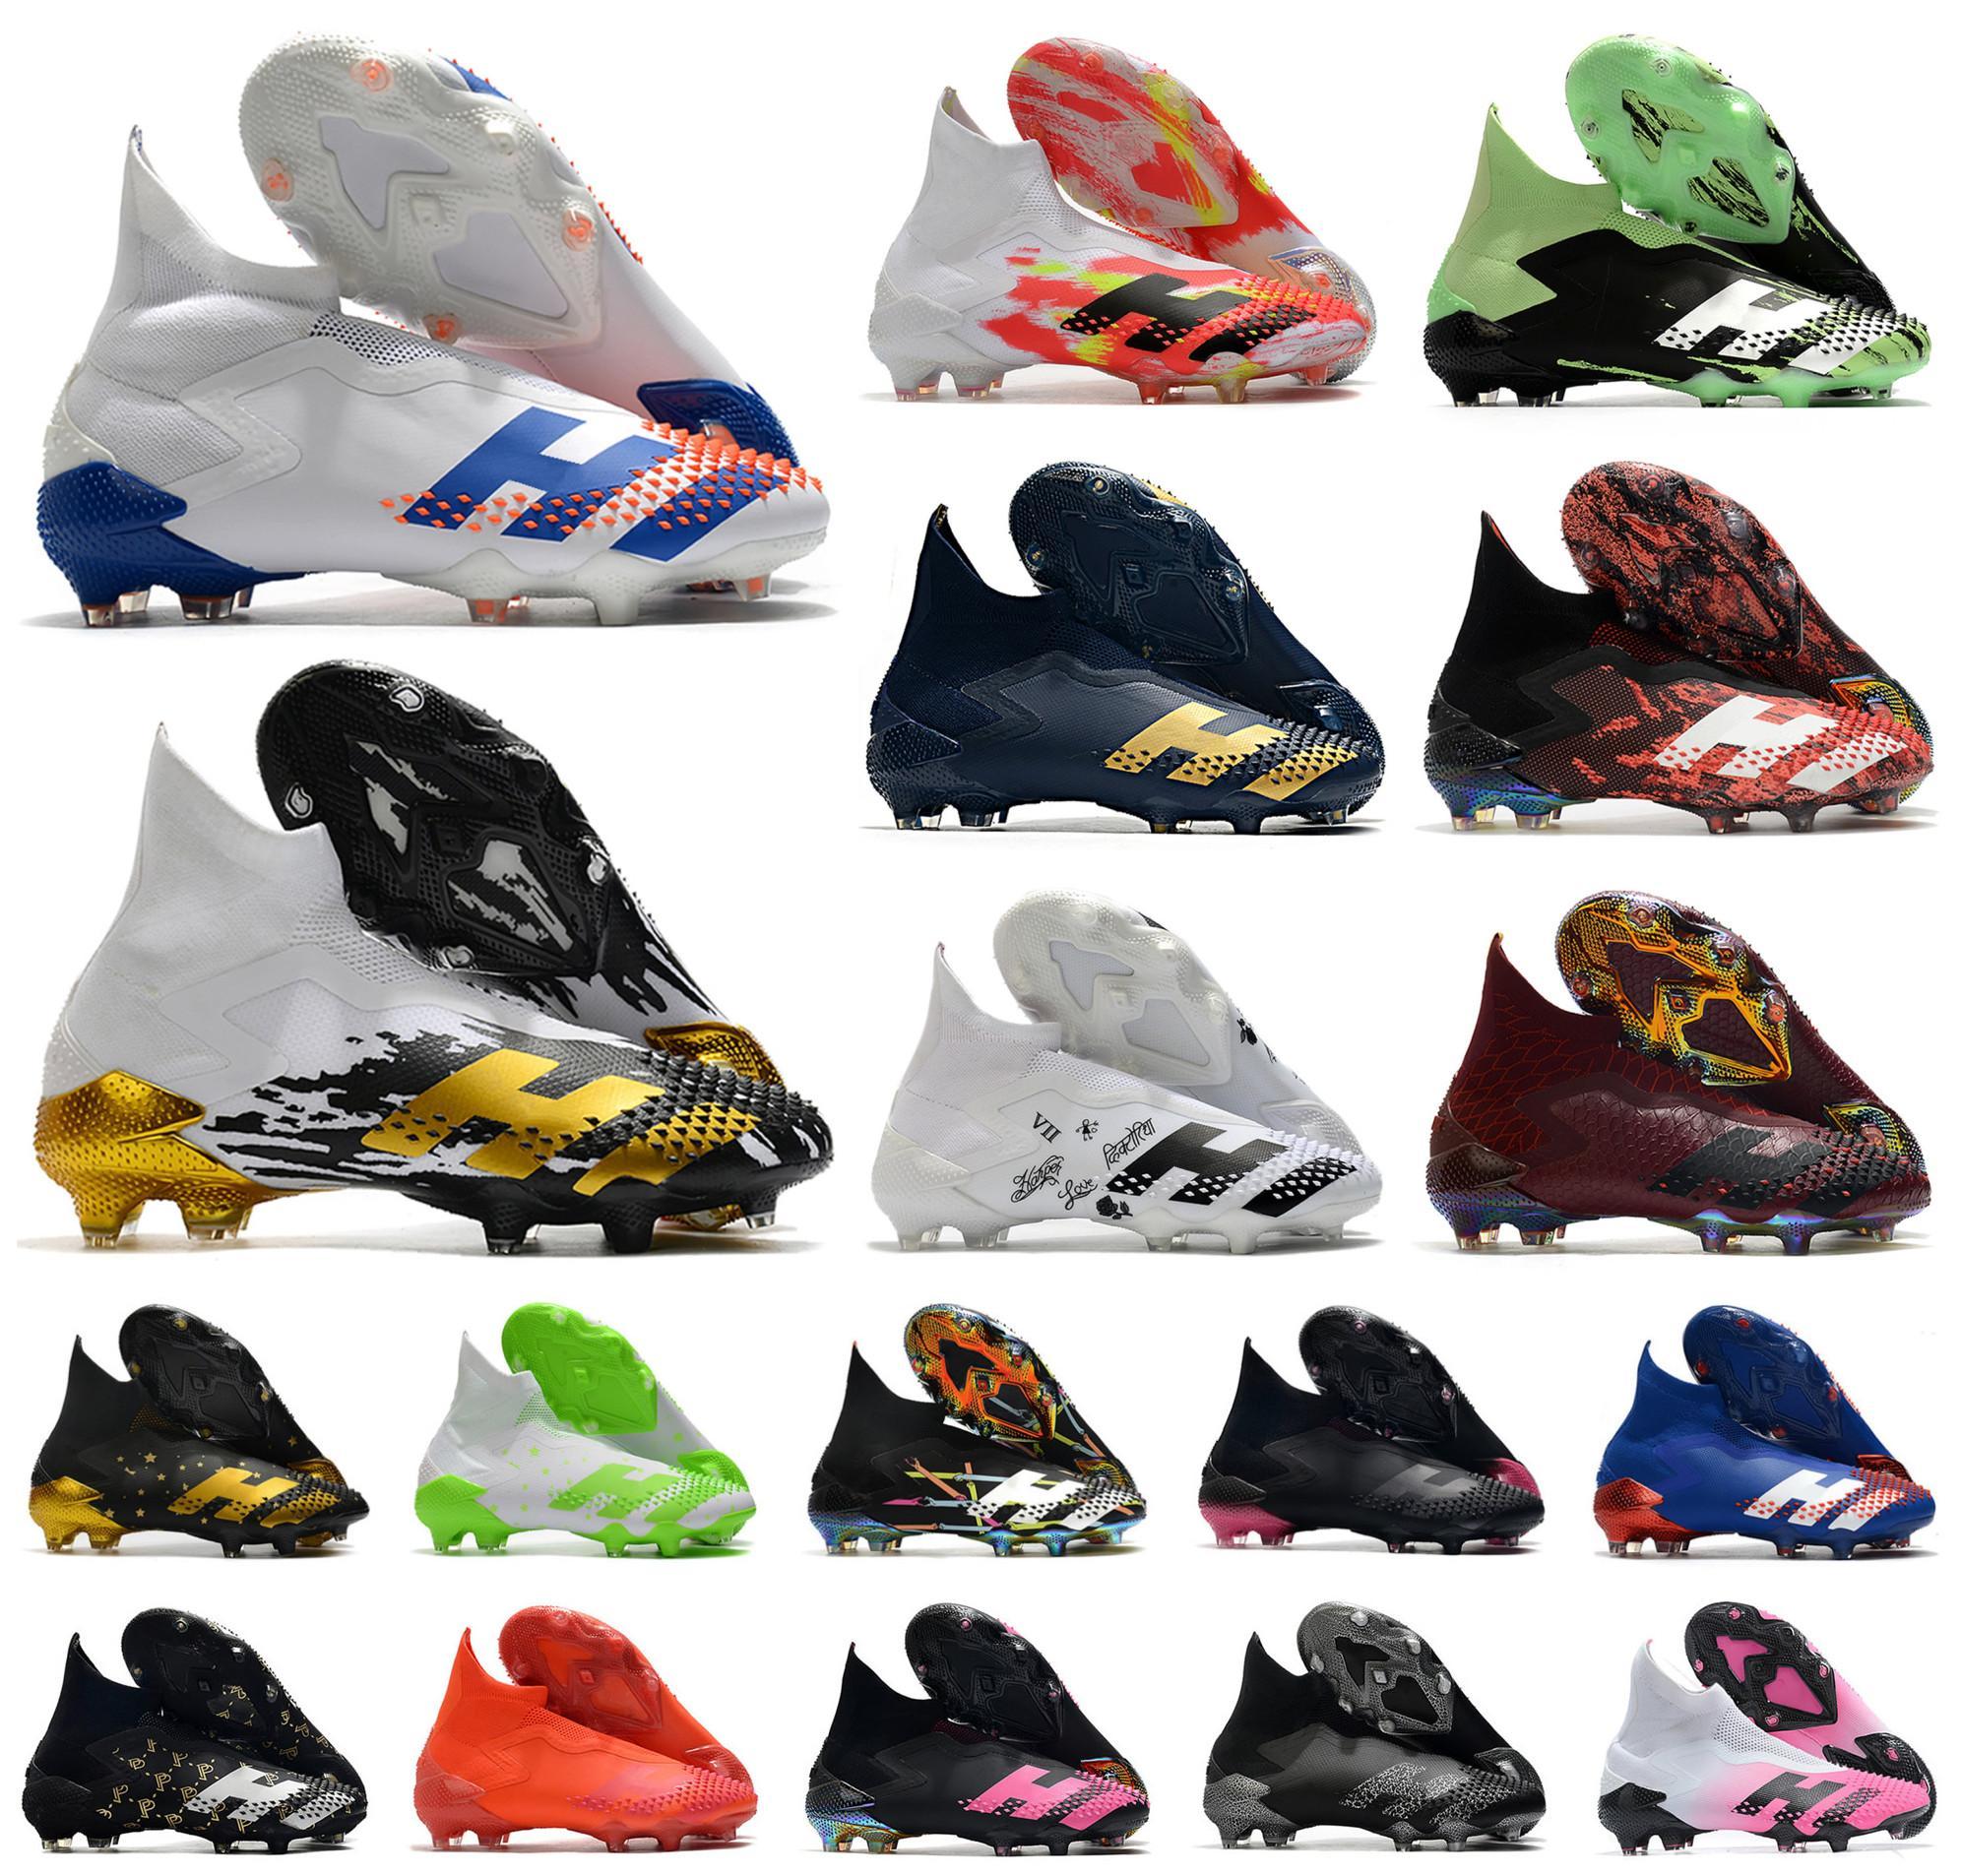 2020 Predator mutateur 20+ FG InFlight SKY TEINTE PP Paul Pogba Garçons Hommes Slip-On chaussures de soccer de football 20 + x Bottes Crampons Haute Taille 39-45